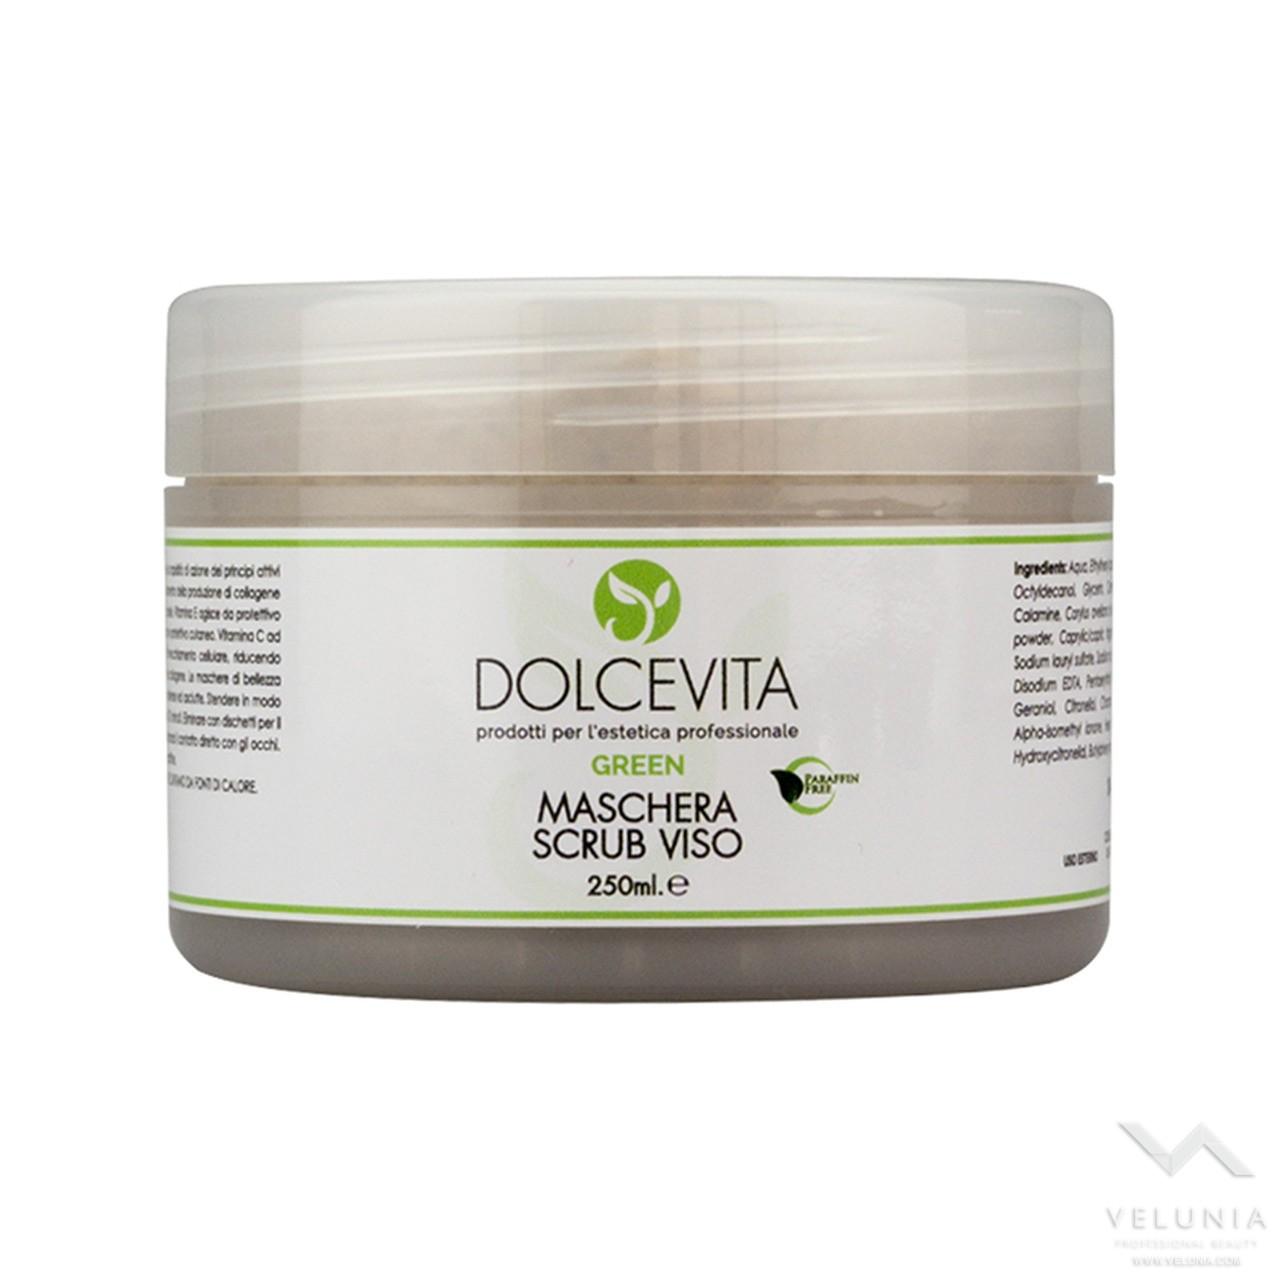 Maschera Scrub Viso - Dolcevita Green - Vaso 250 ml 1